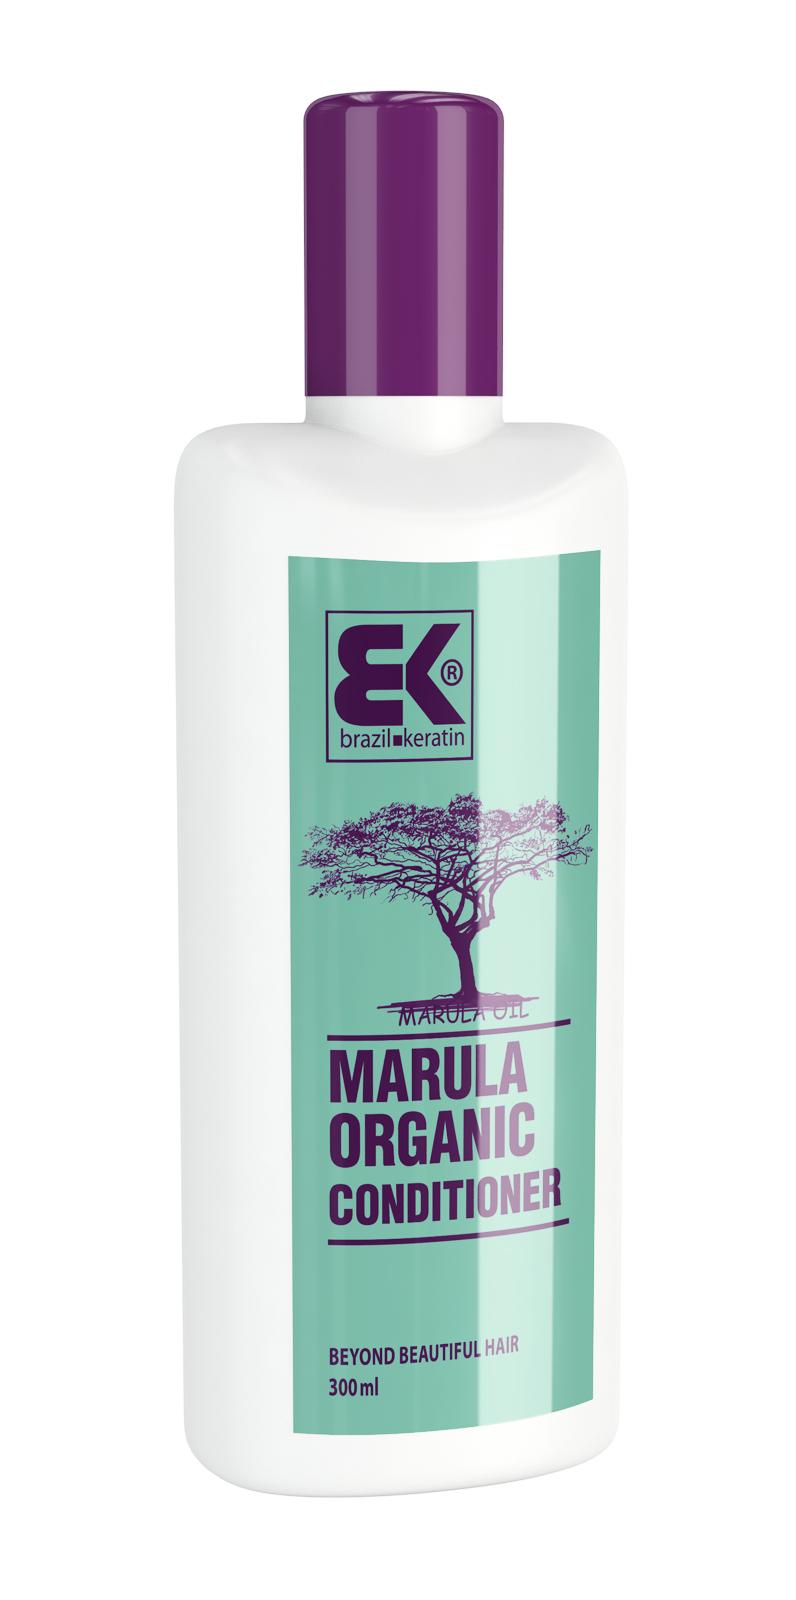 BK Brazil Keratin Marula Conditioner - BIO keratinový kondicionér s marulovým olejem 300 ml